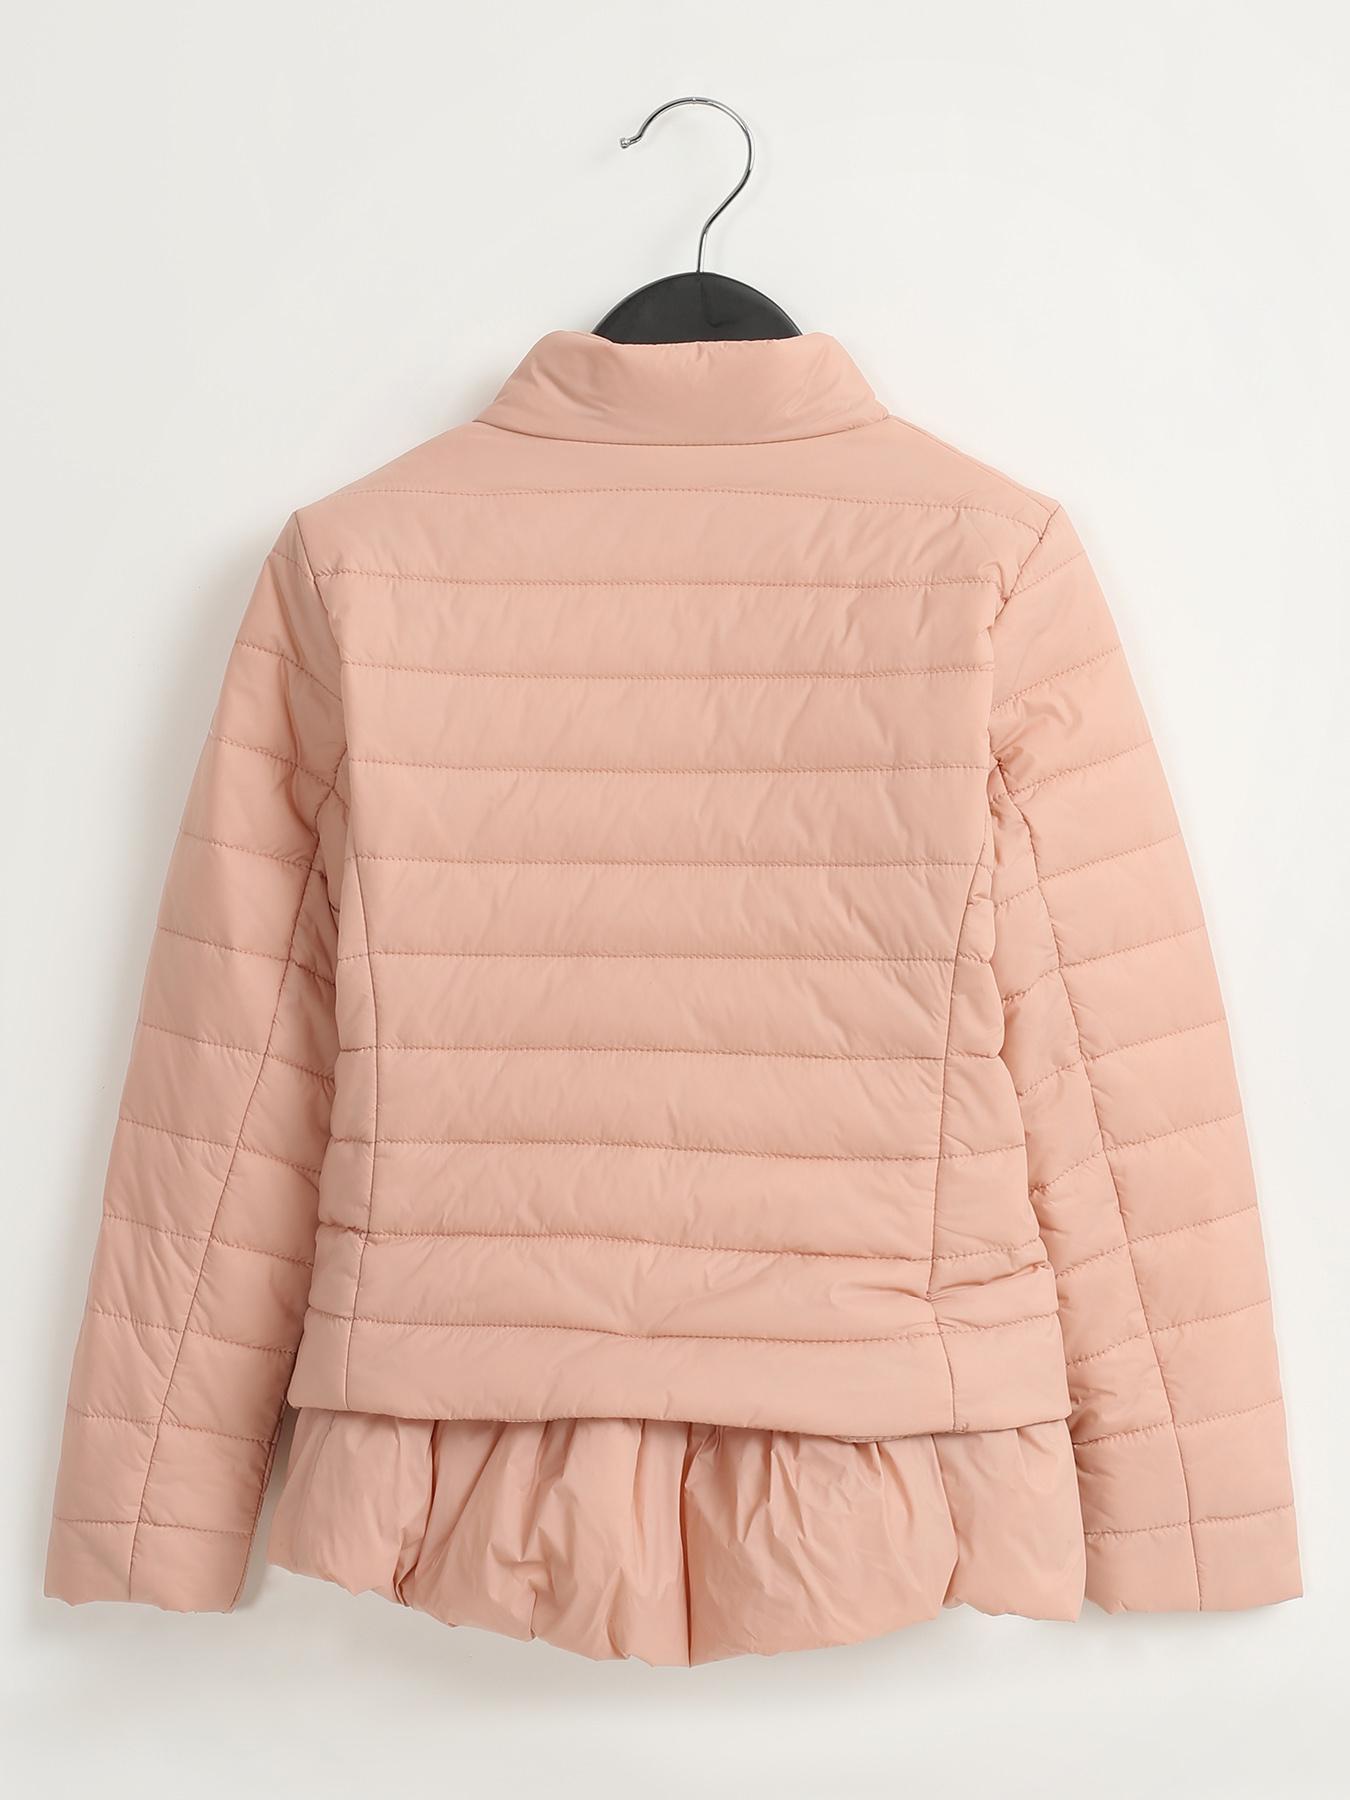 Finisterre Куртка для девочки фото